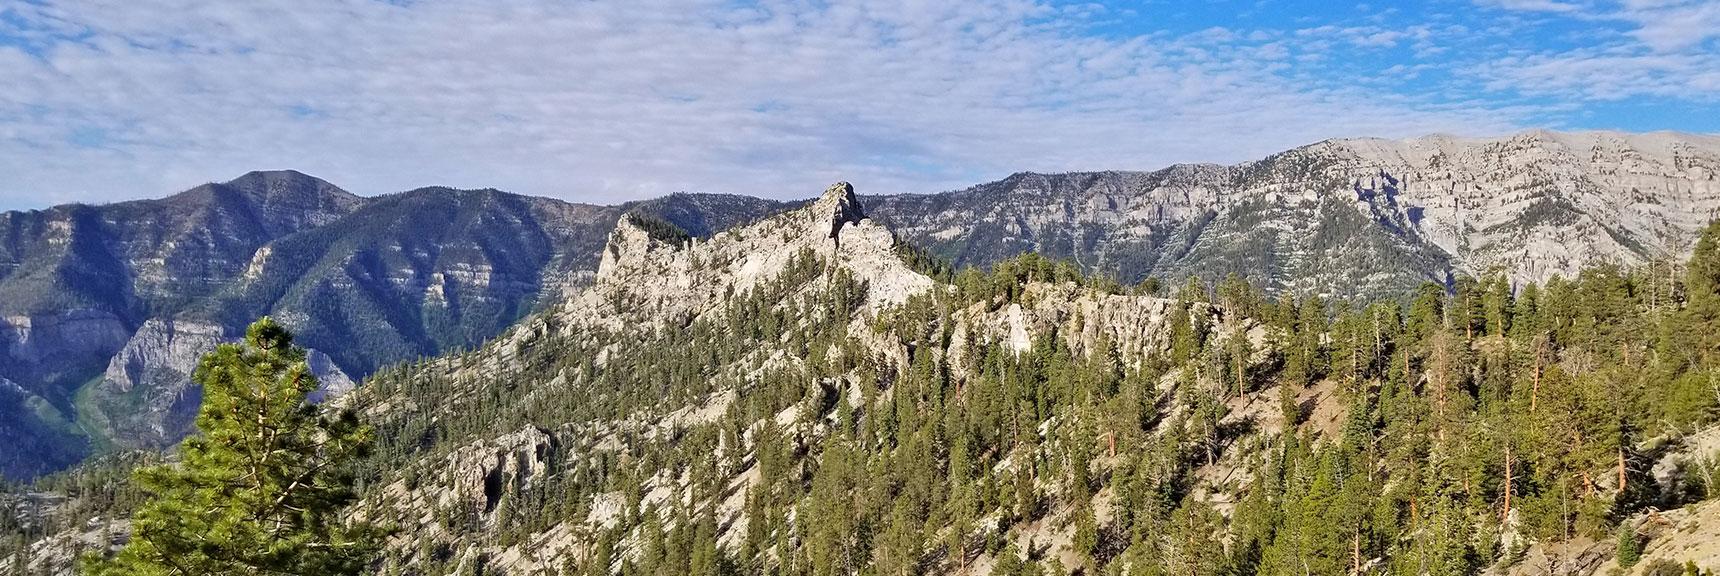 Cockscomb Ridge from the East on North Loop Trail | Mummy Mountain's Knees | Mt. Charleston Wilderness, Nevada 004